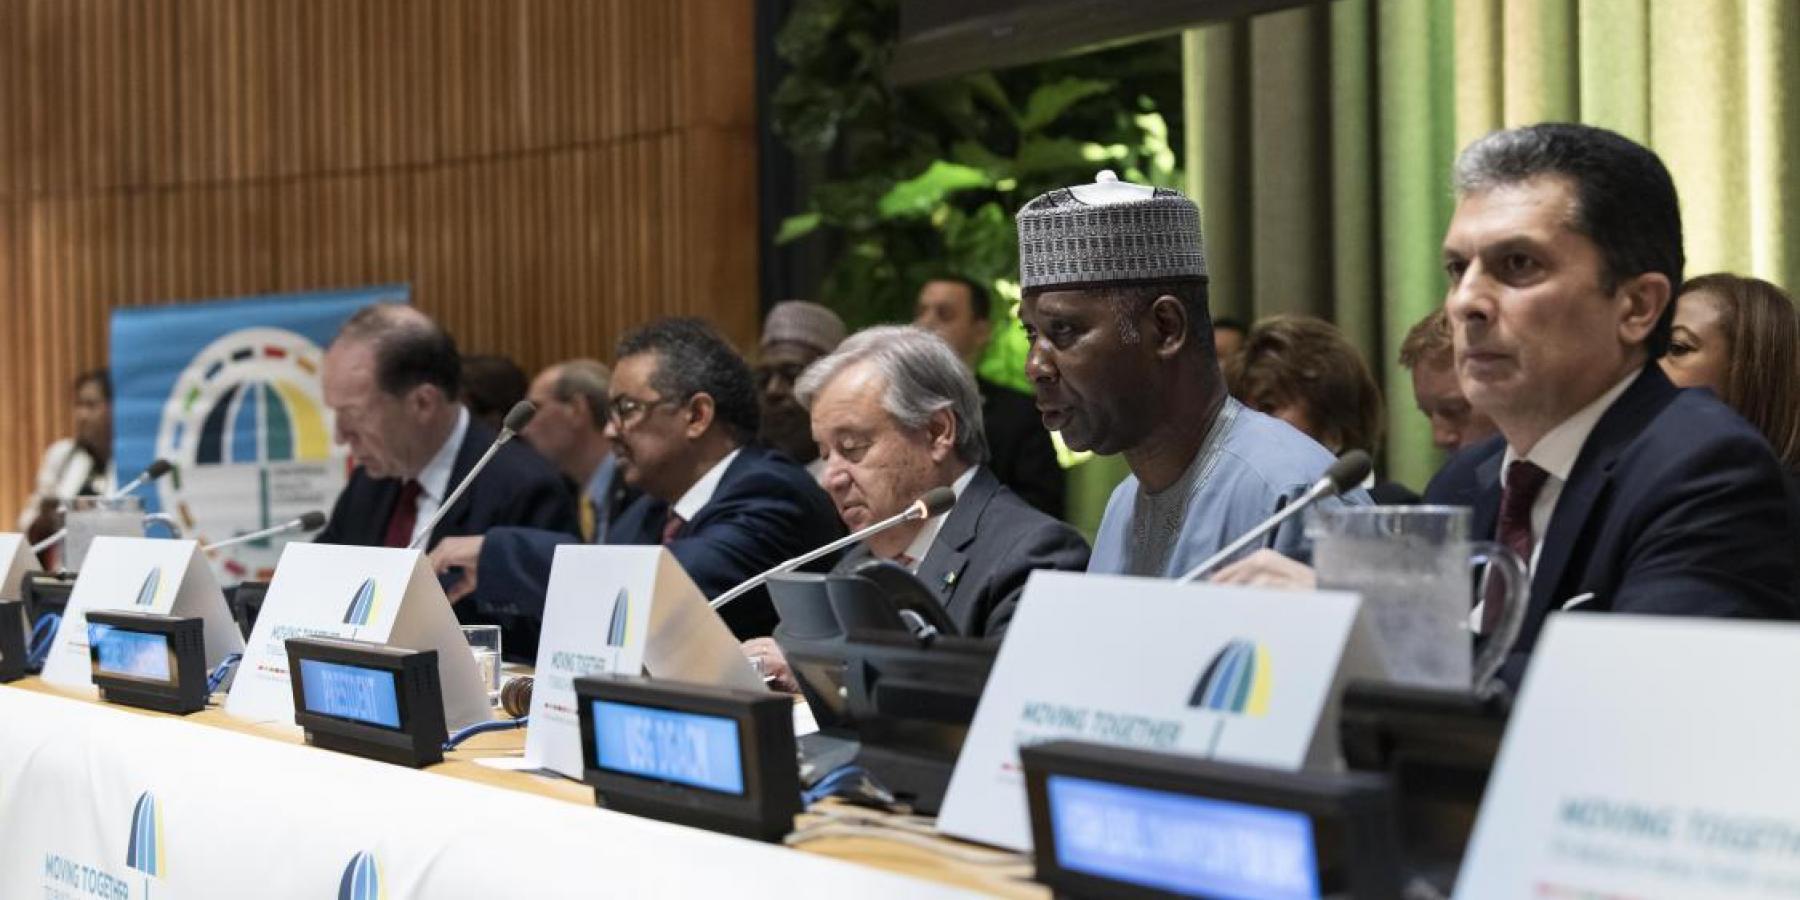 UN High-level Meeting on Universal Health Coverage, 23 September 2019, New York, US © UN Photo/Kim Haughton